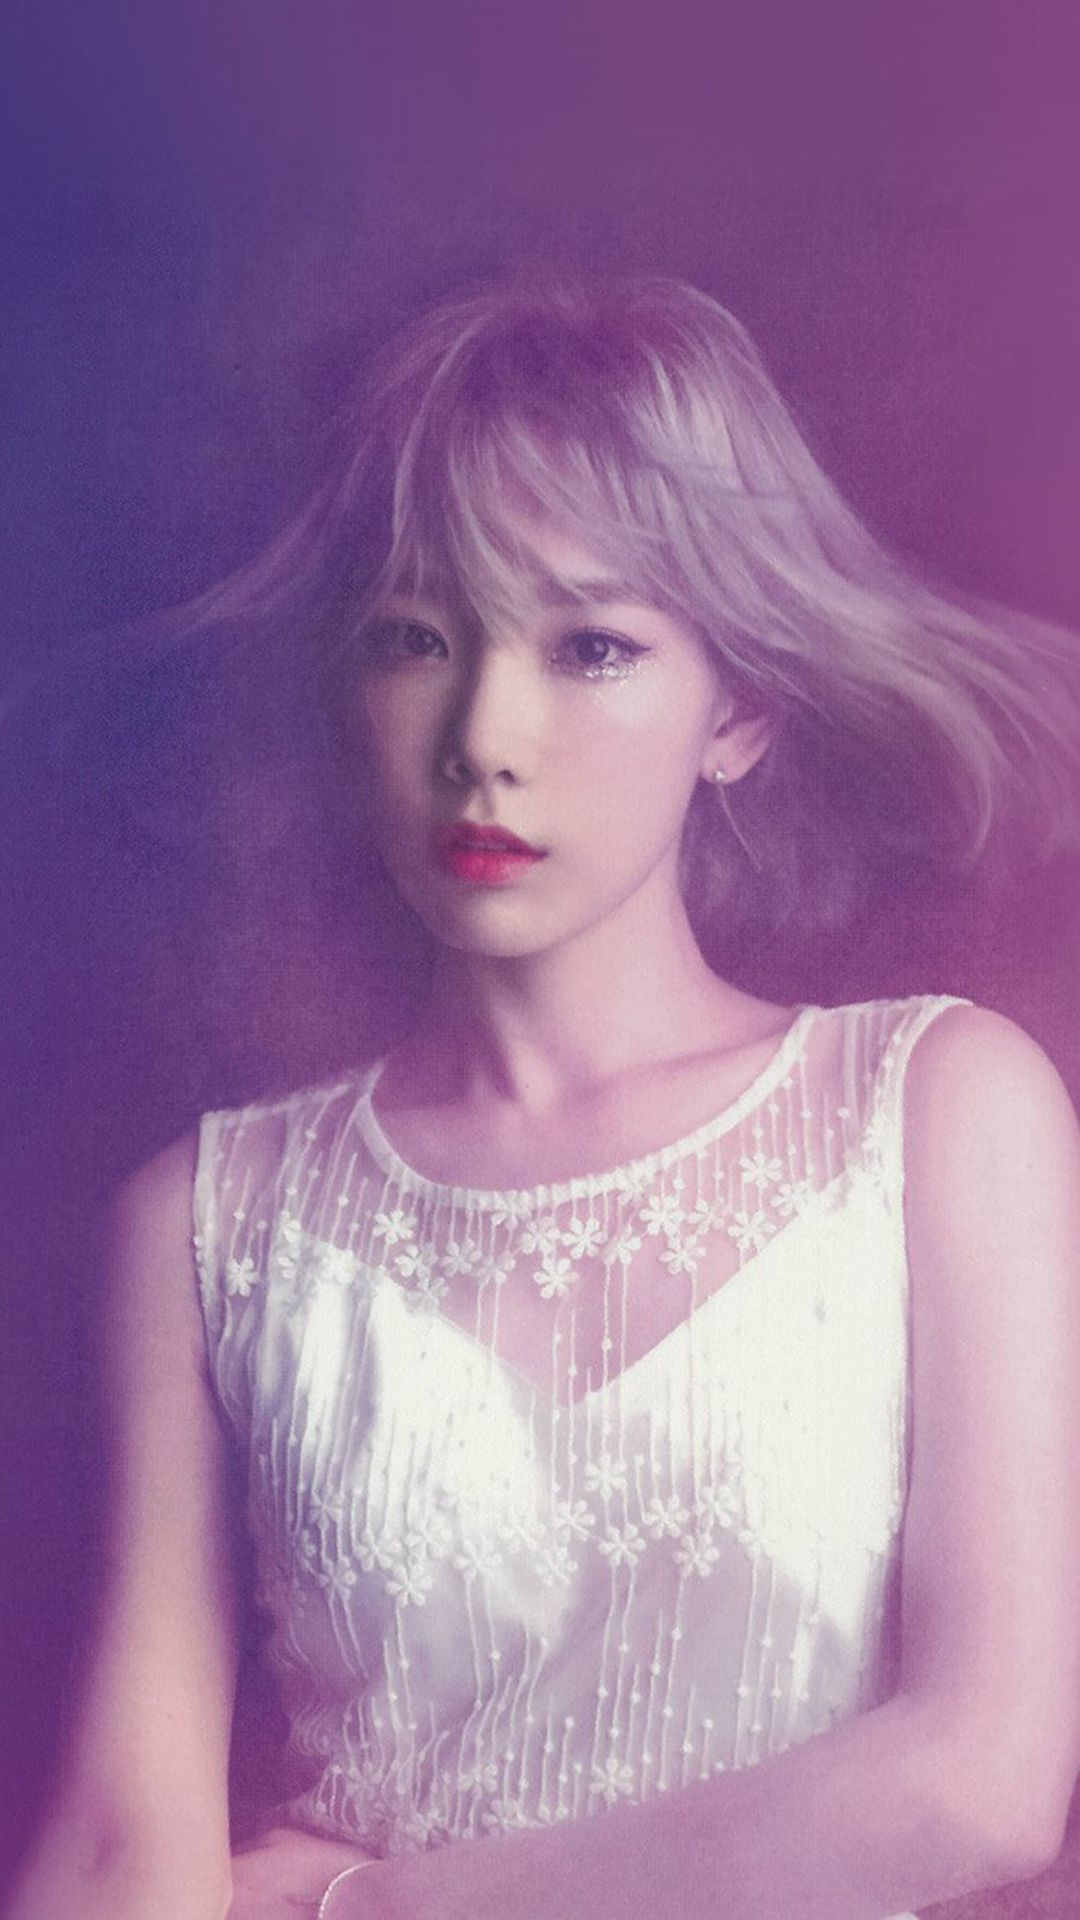 Taeyeon Snsd Kpop Girl Purple Pink #iPhone #6 #plus # ...